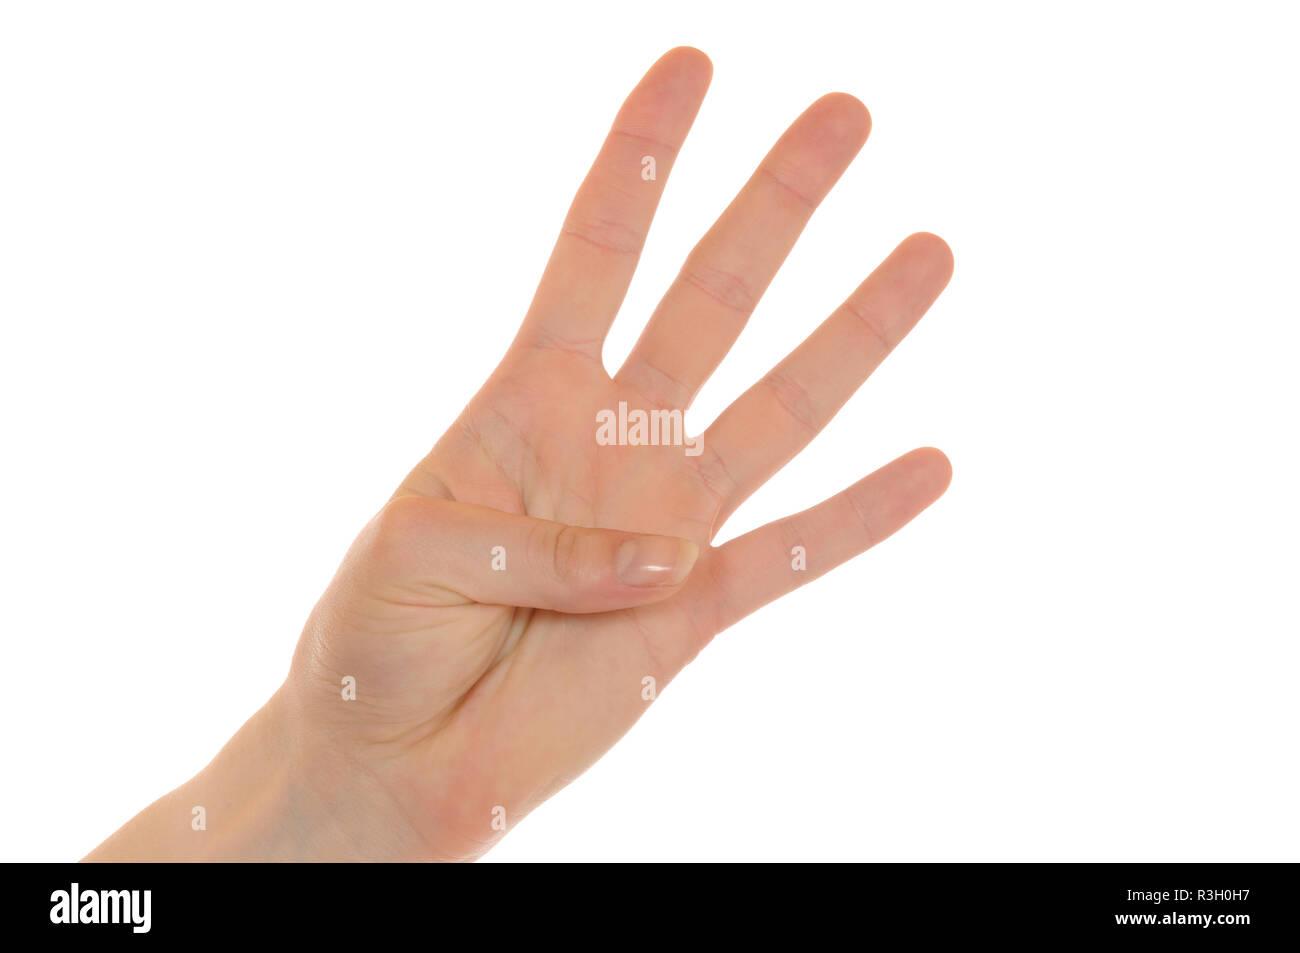 hand - Stock Image